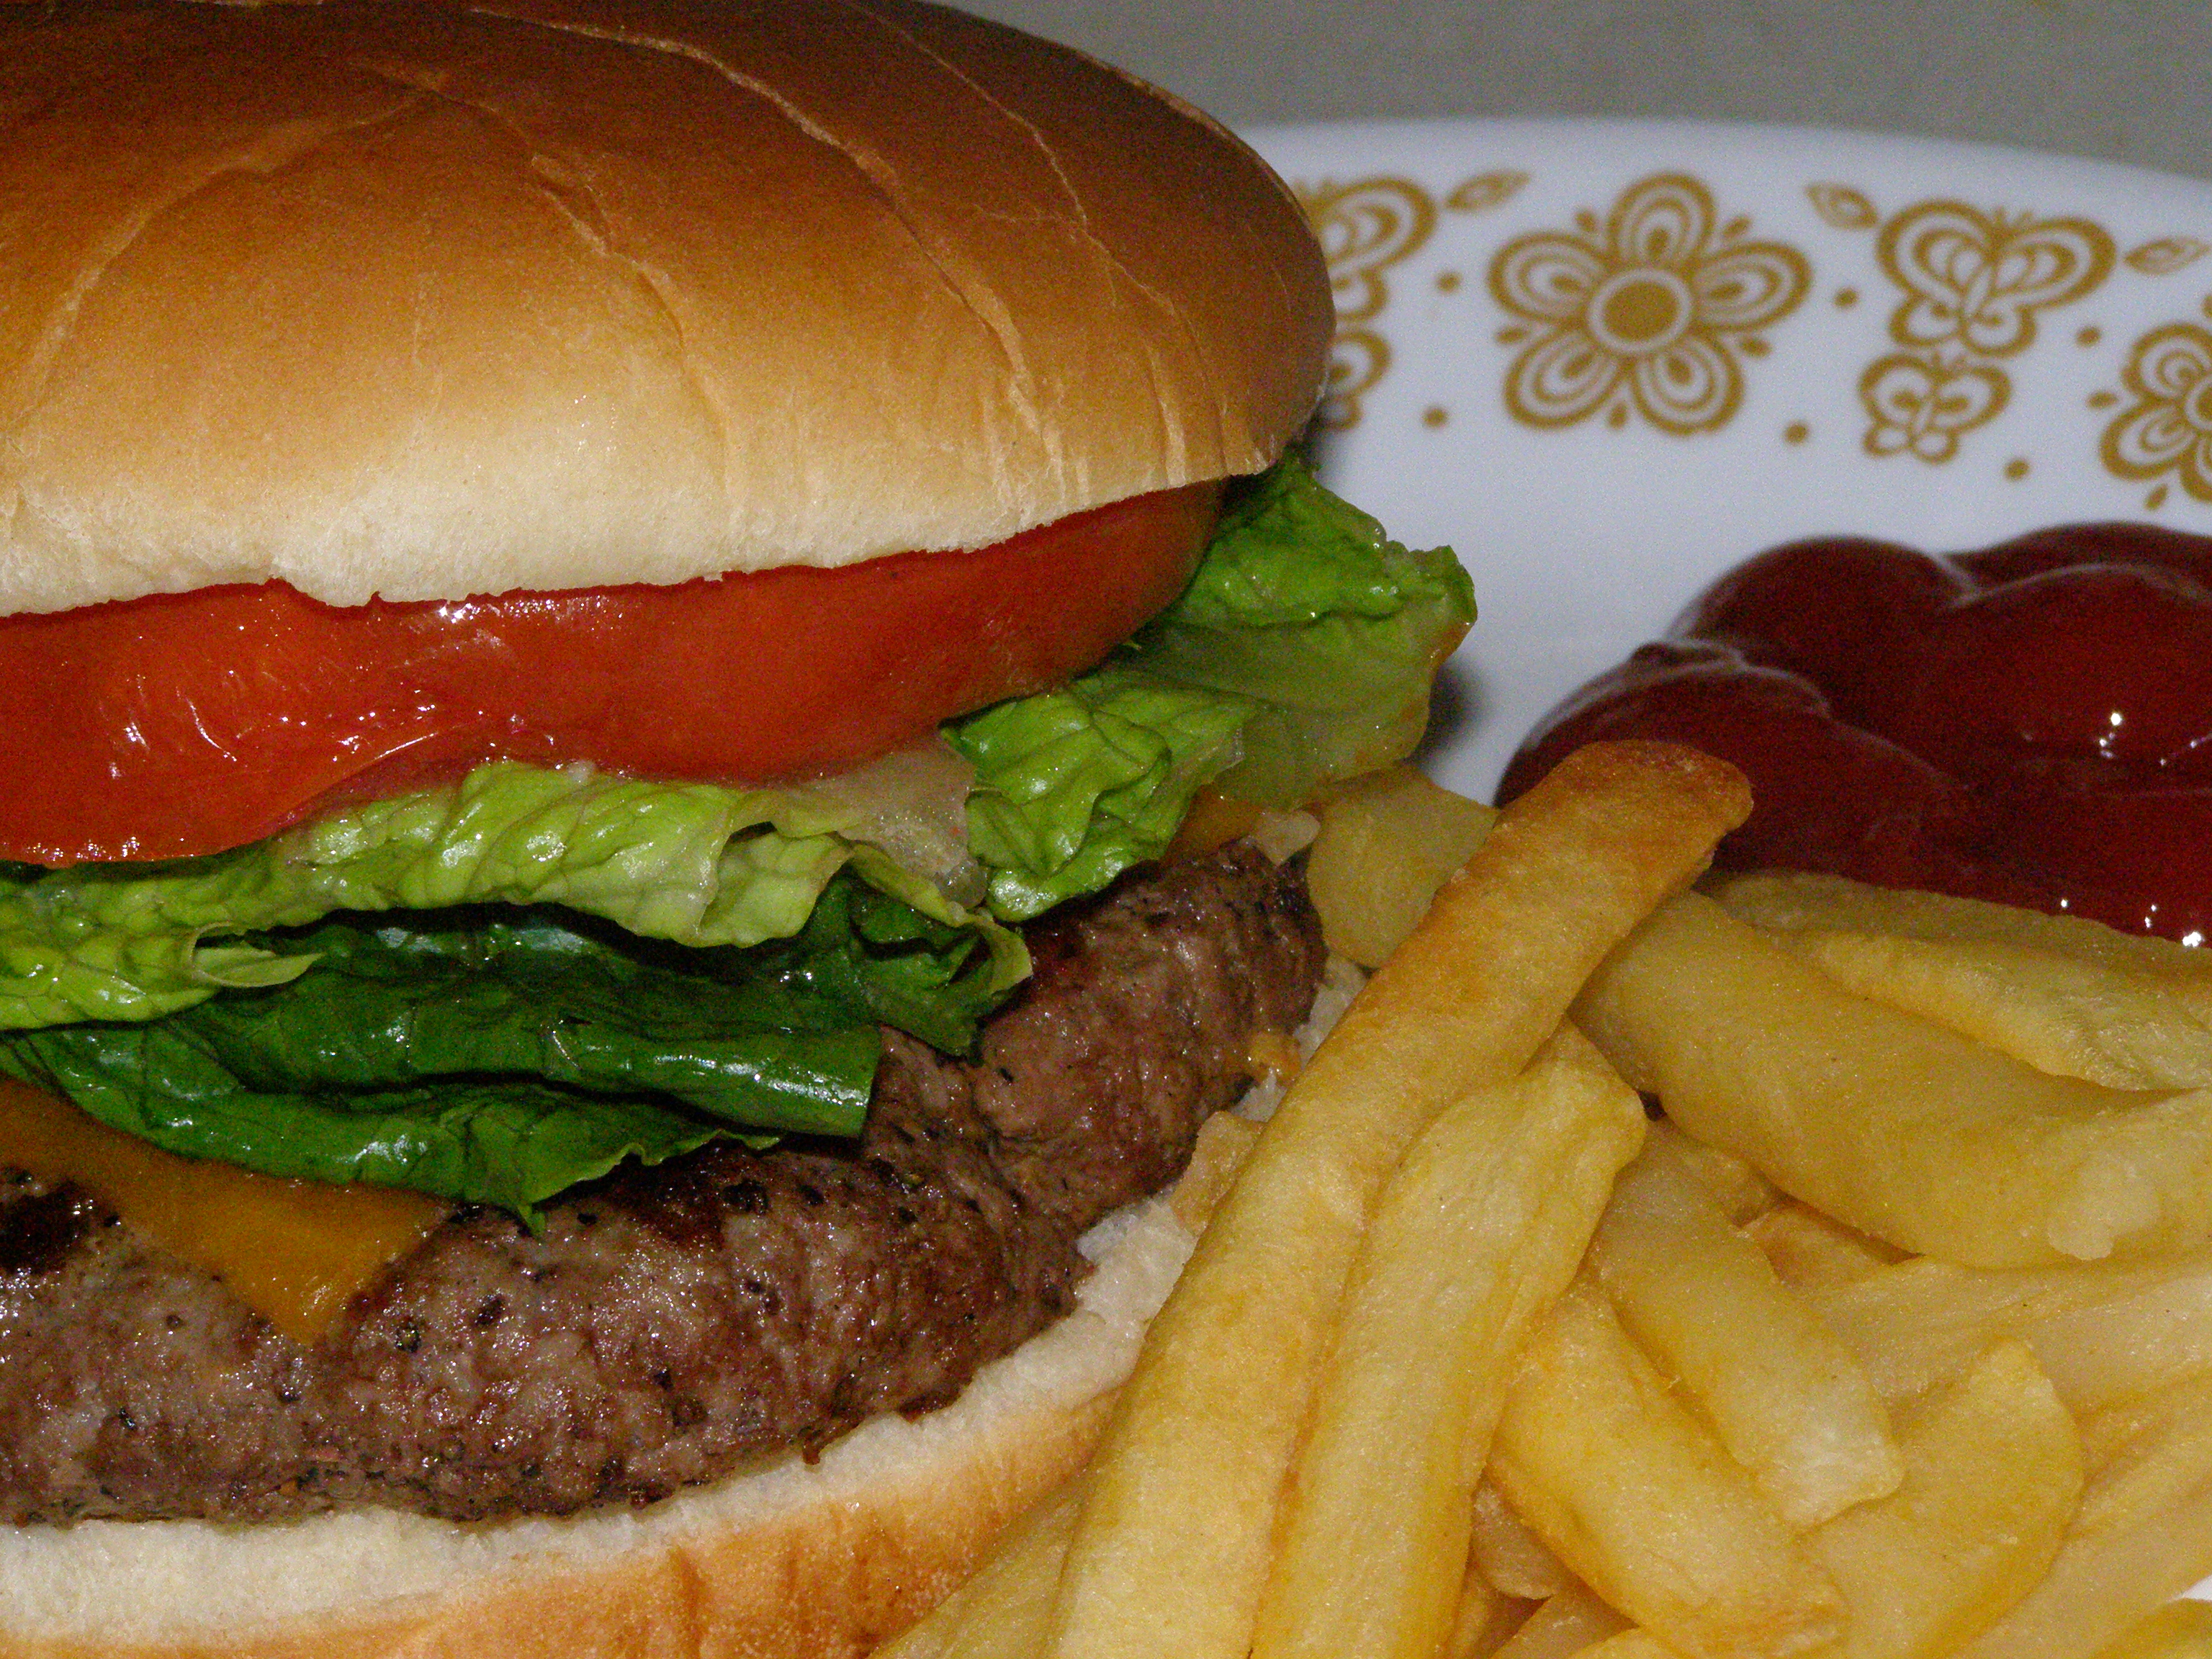 Foodies Love Affair: Cheeseburgers!!!